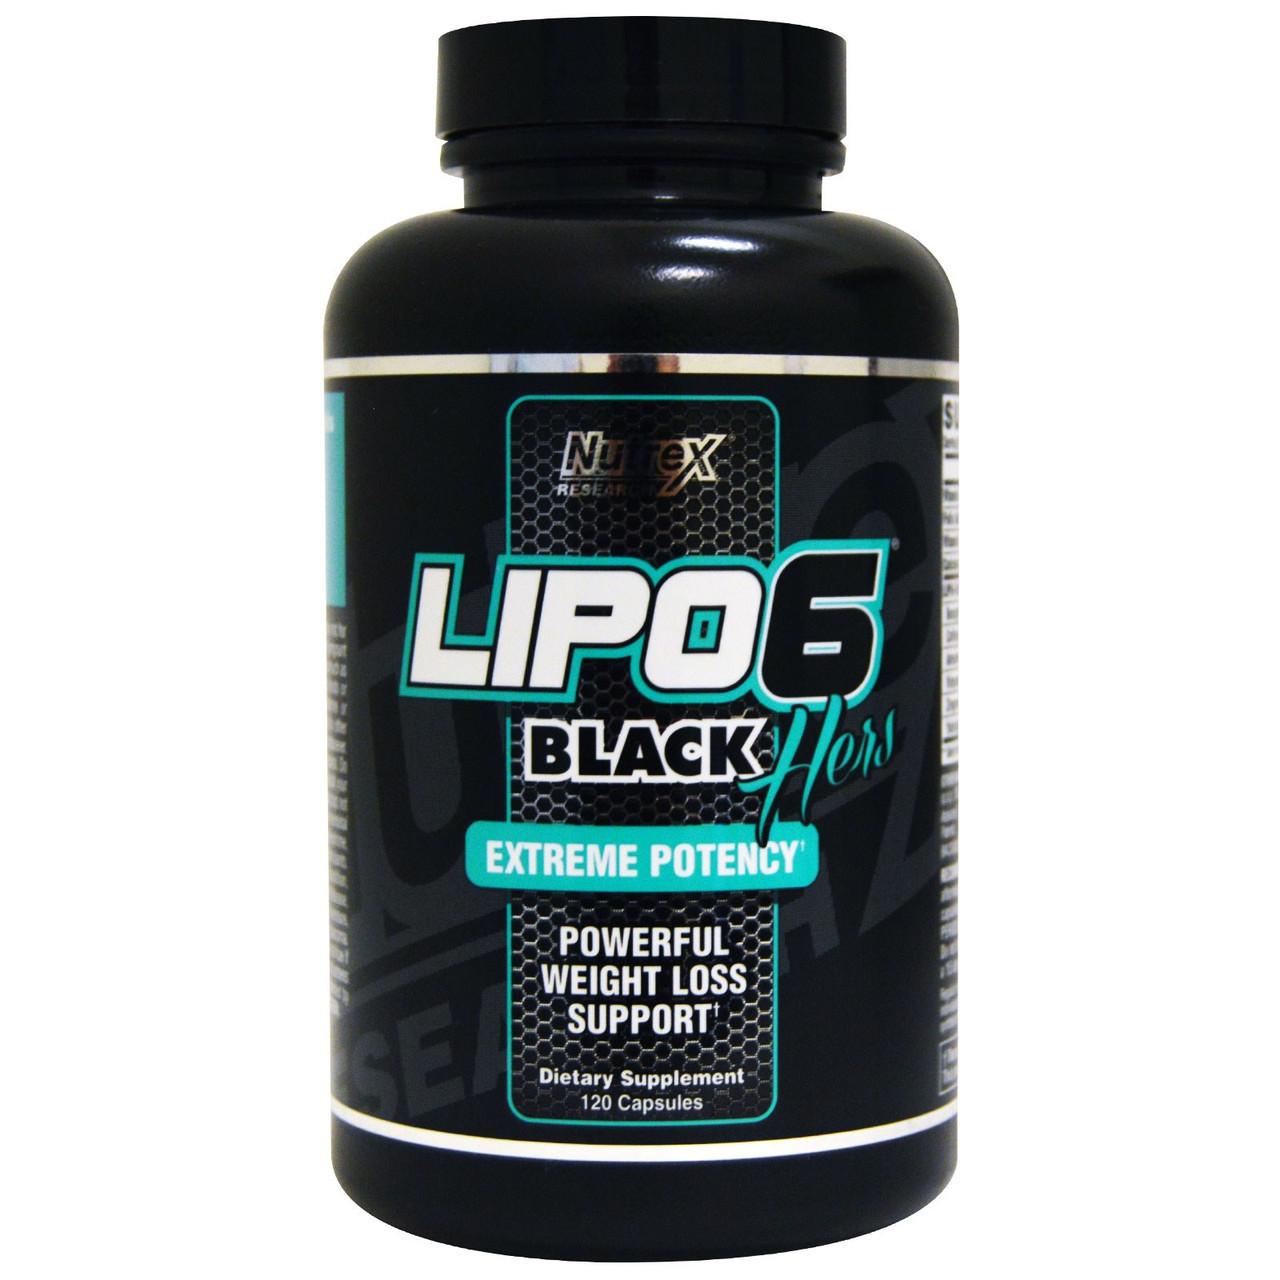 Жиросжигатель Nutrex Research - Lipo-6 Black Hers Extreme Potency (120 капсул)